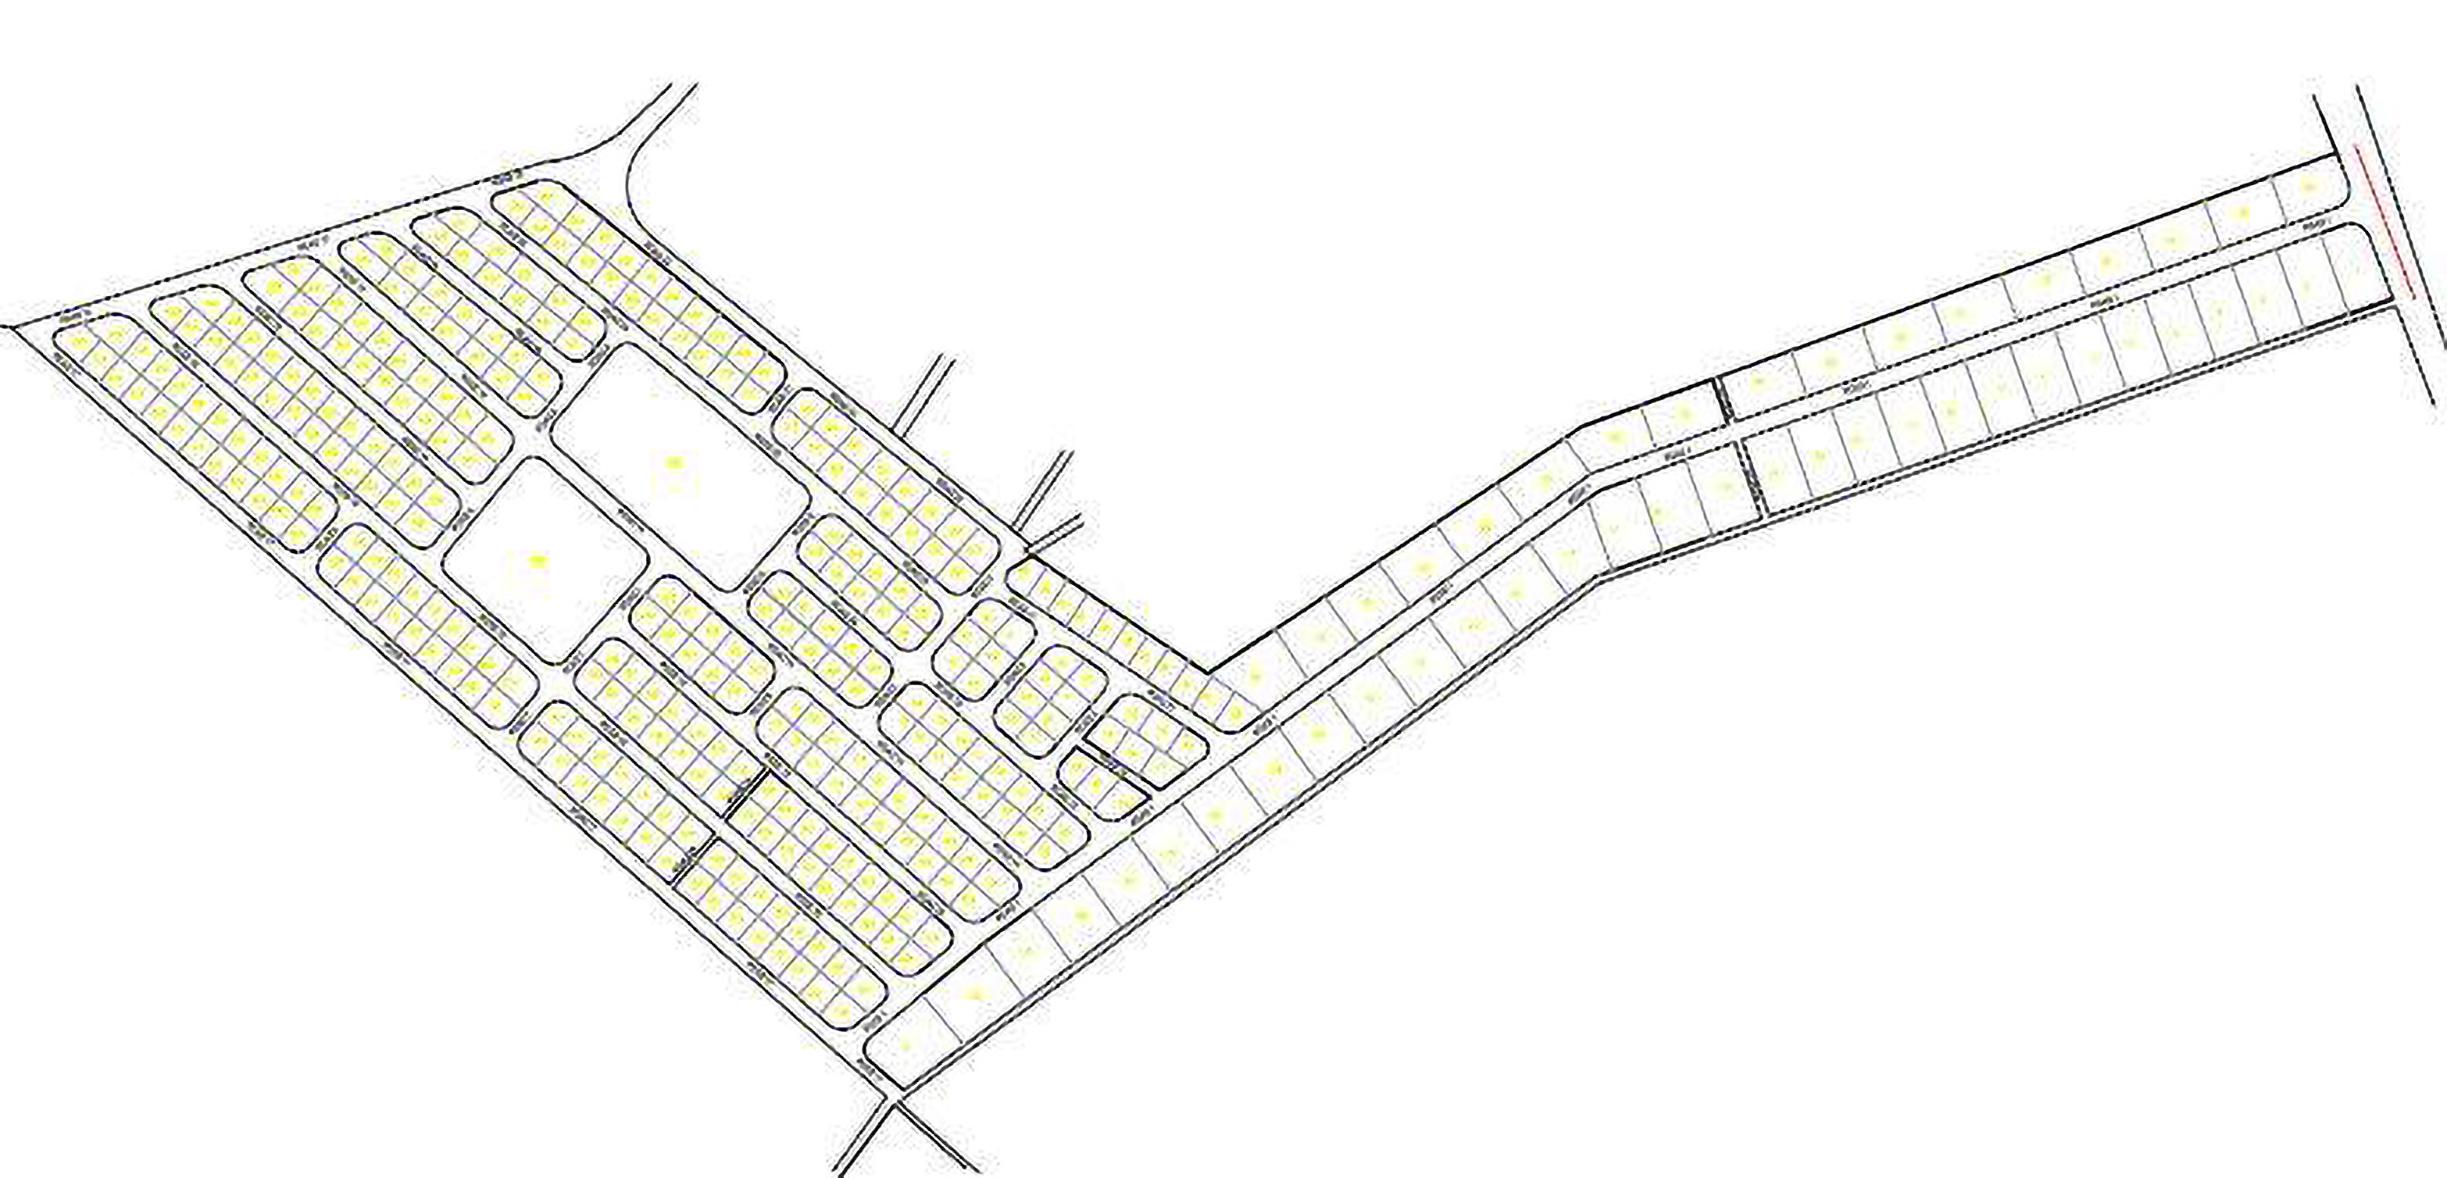 Water networks and roads for Iskan Thughret Al Jub –Zaatari